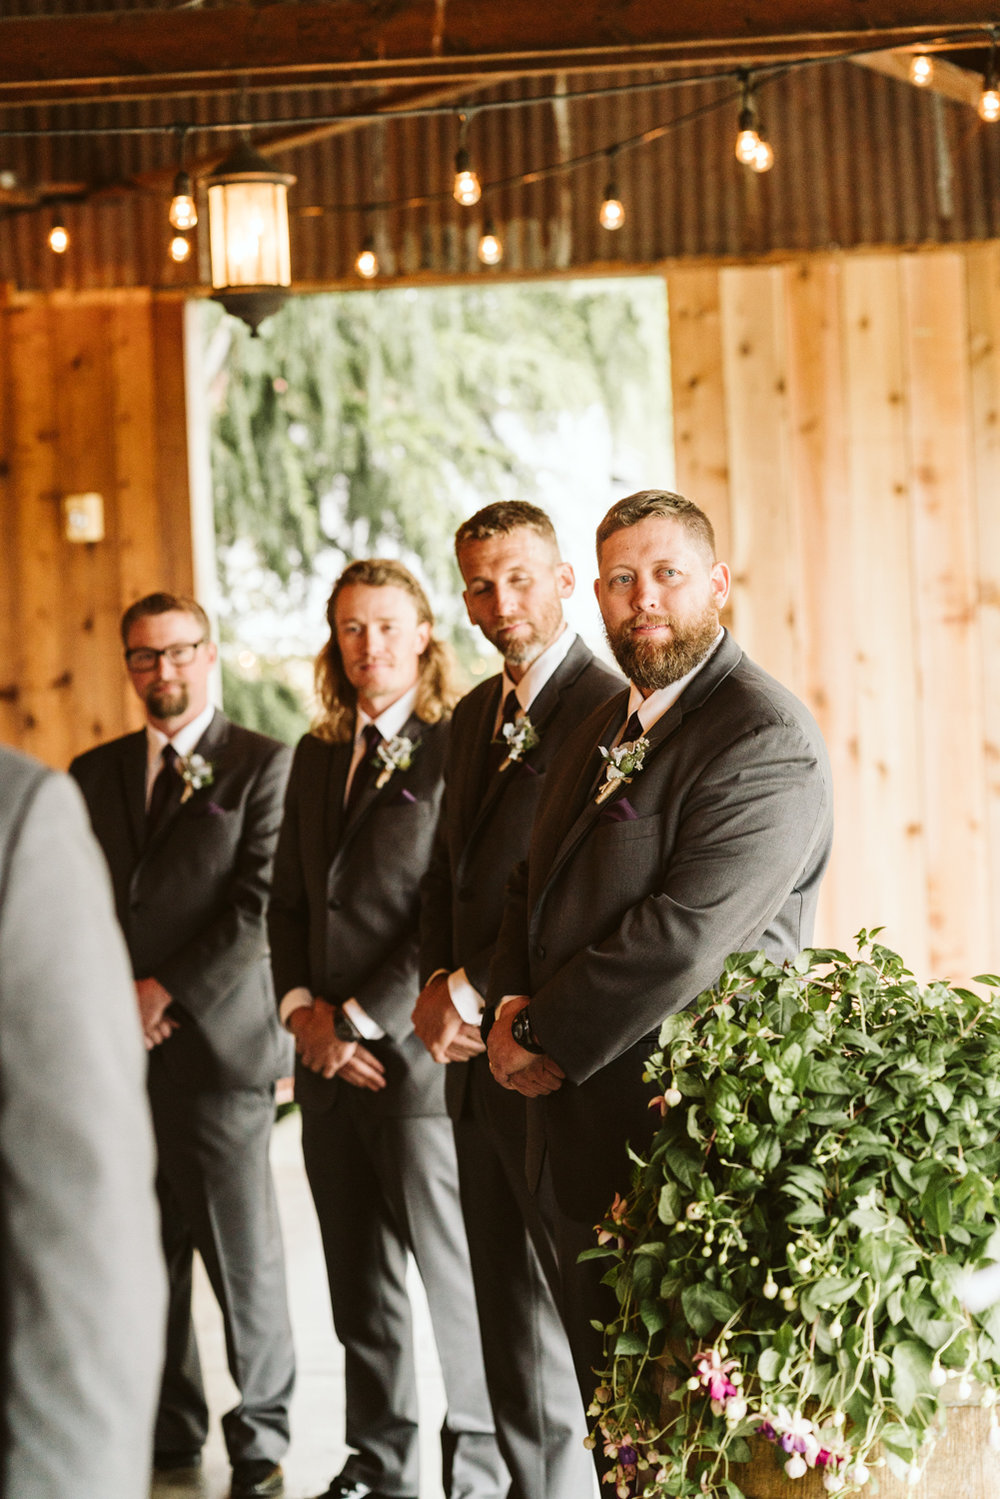 April Yentas Photography - jen and anthony wedding-50.jpg